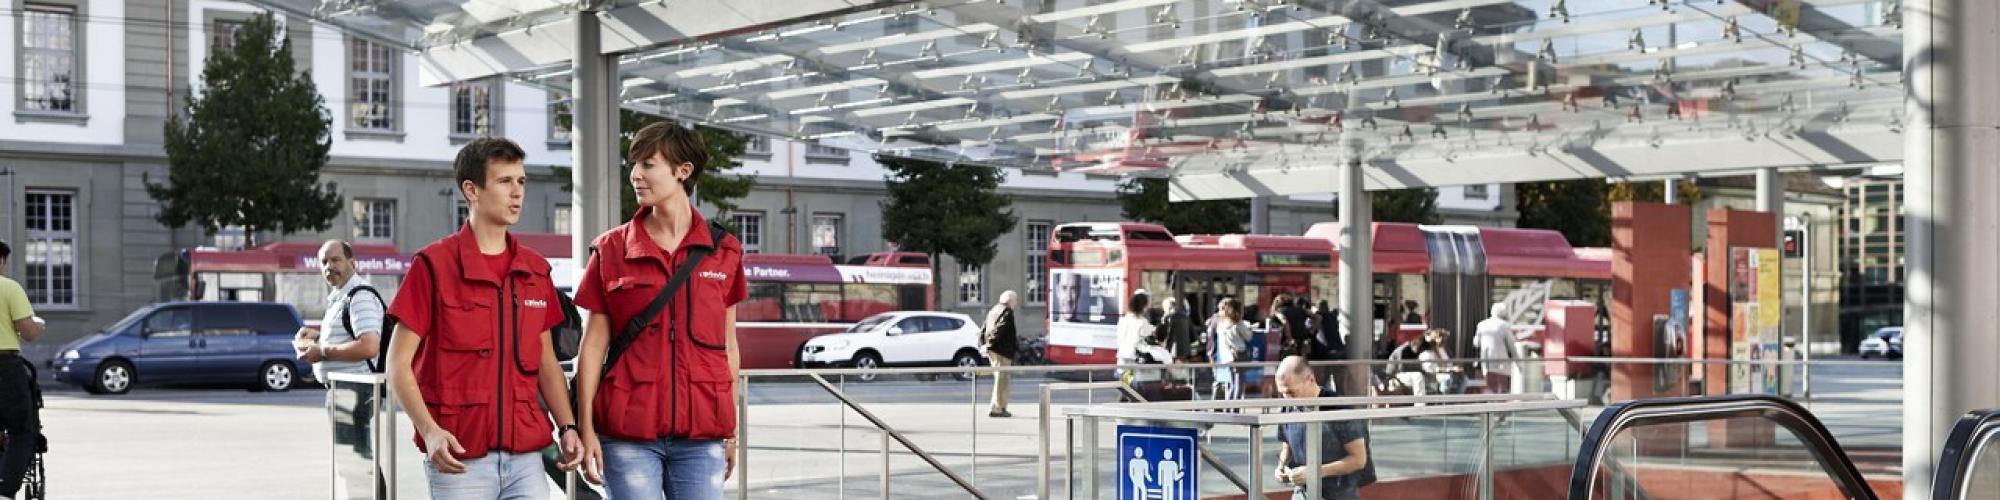 Pinto / Familie & Quartier Stadt Bern